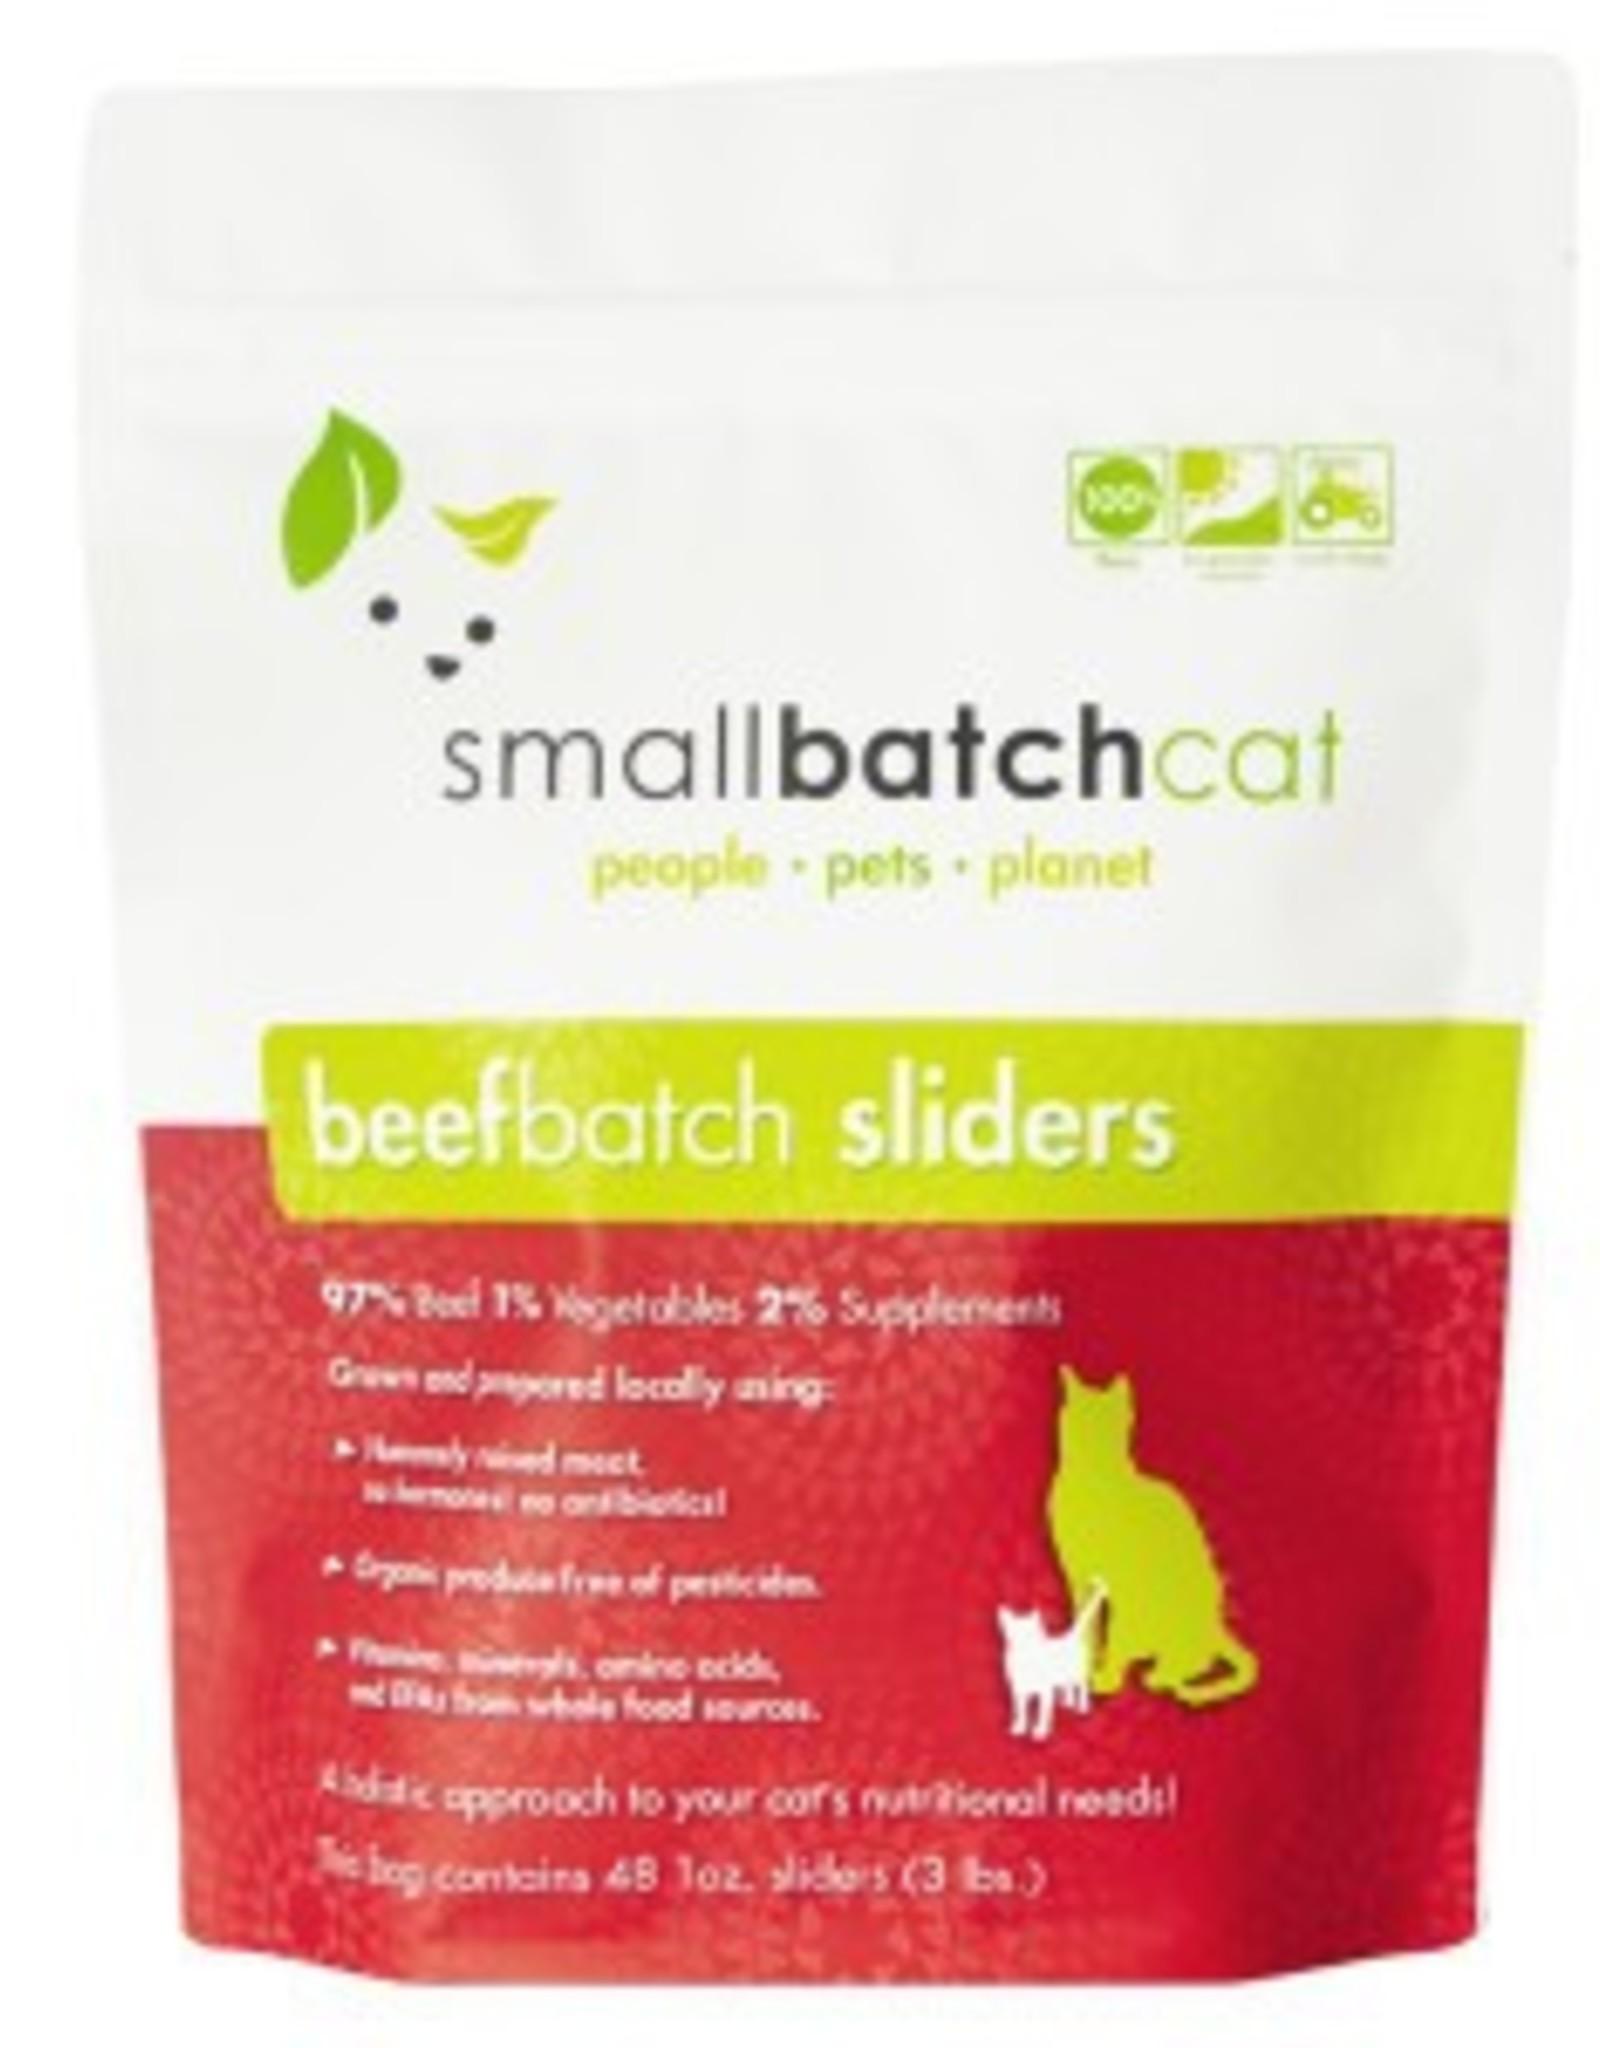 Smallbatch Smallbatch Cat Beef Sliders 3lb